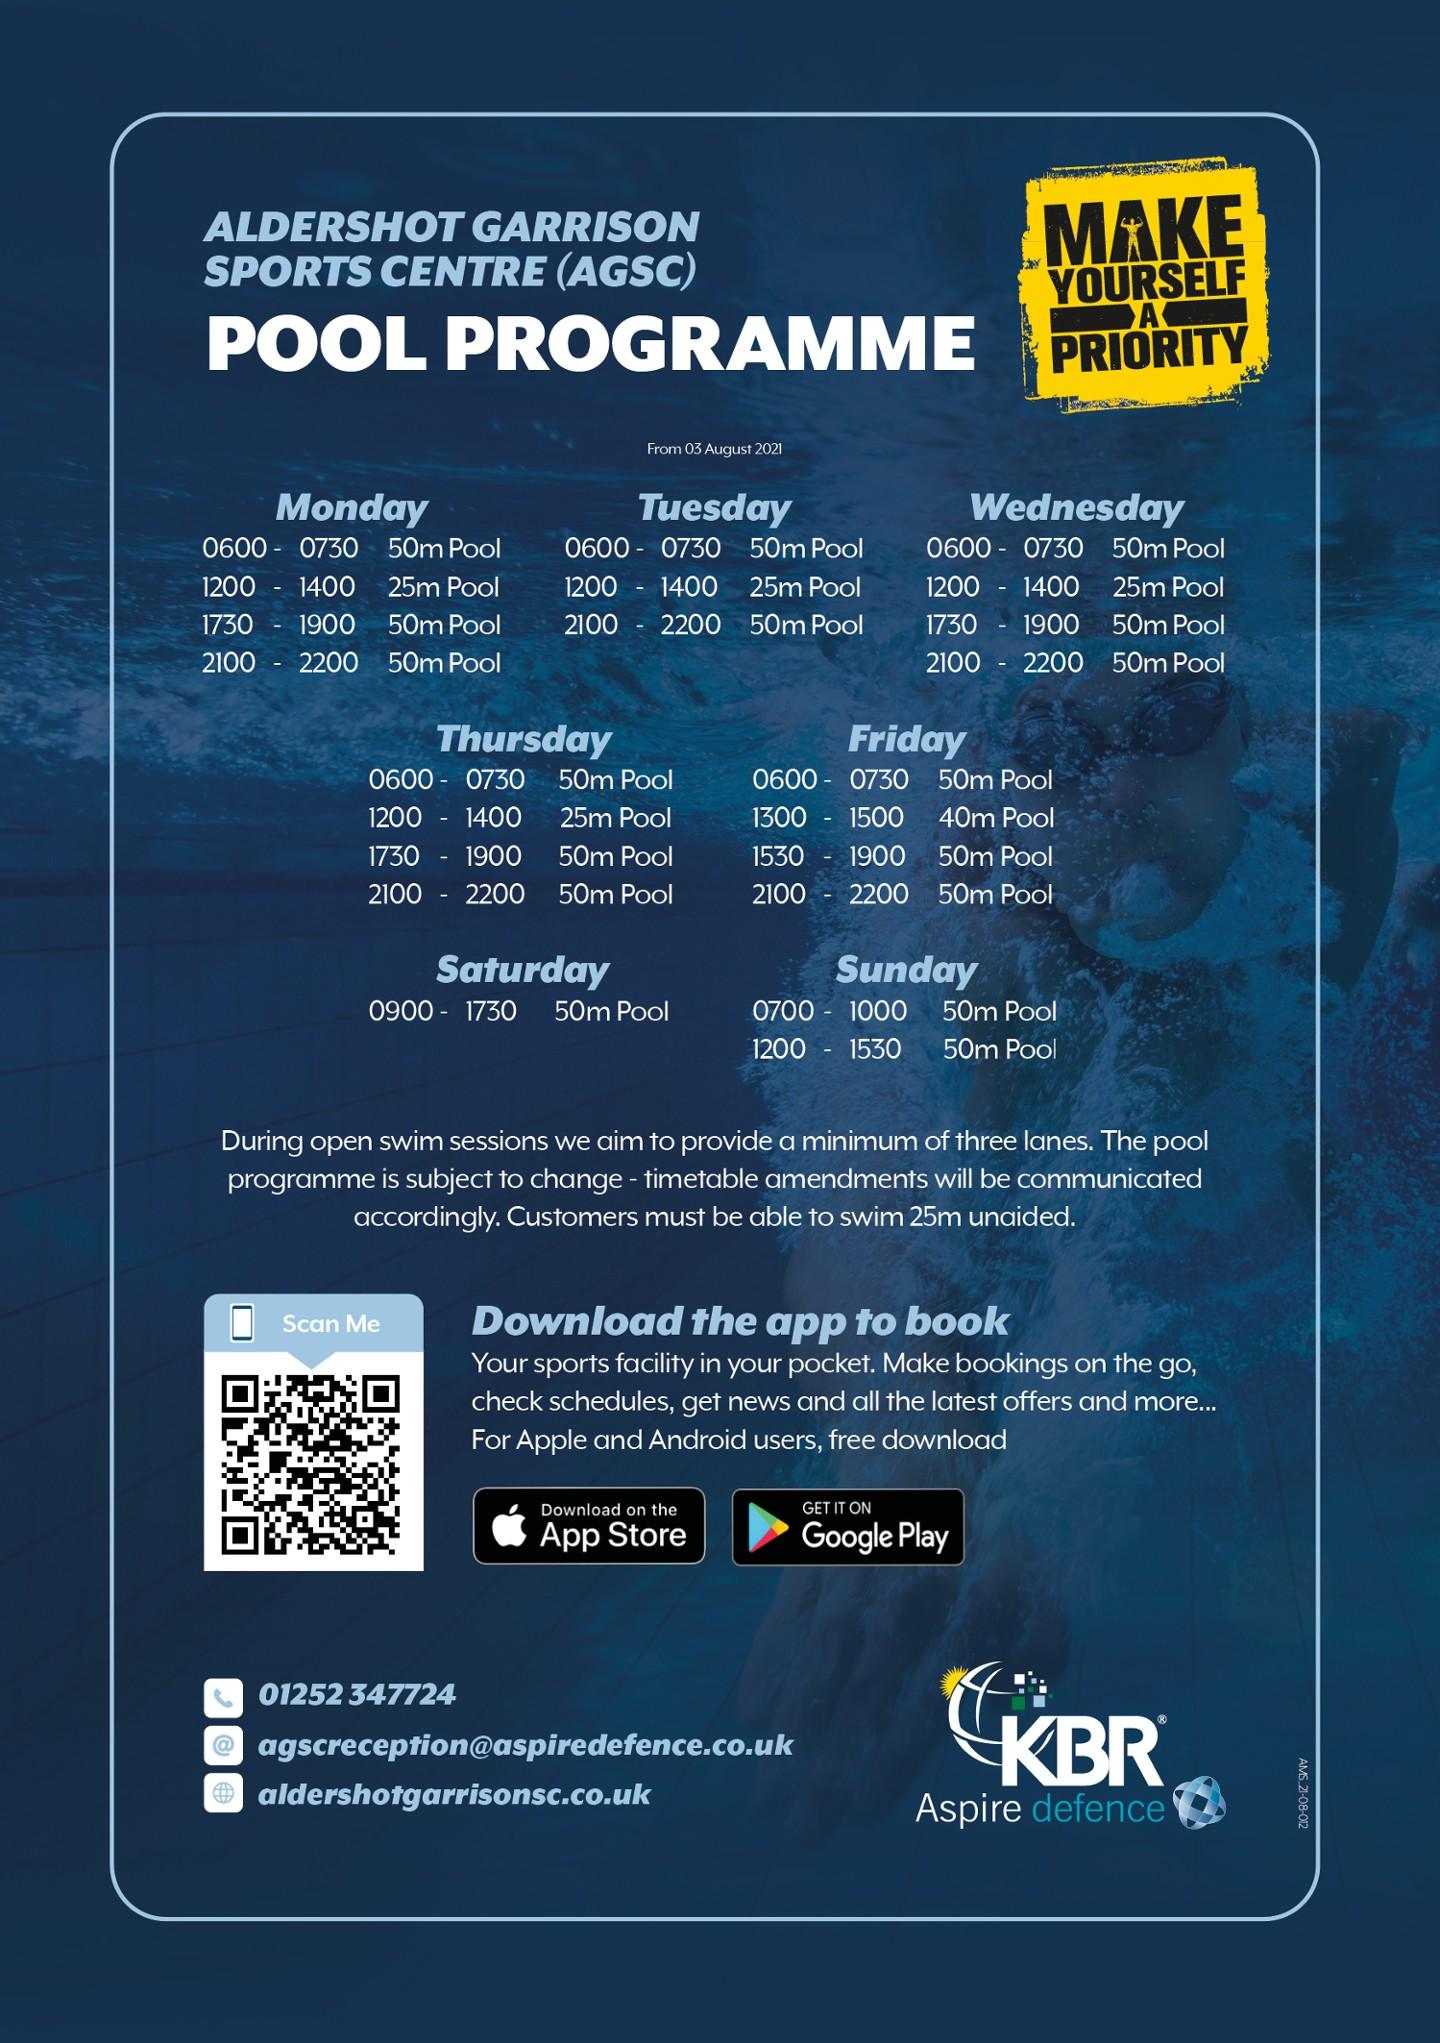 Open Swim 1200-1400 - Back on today